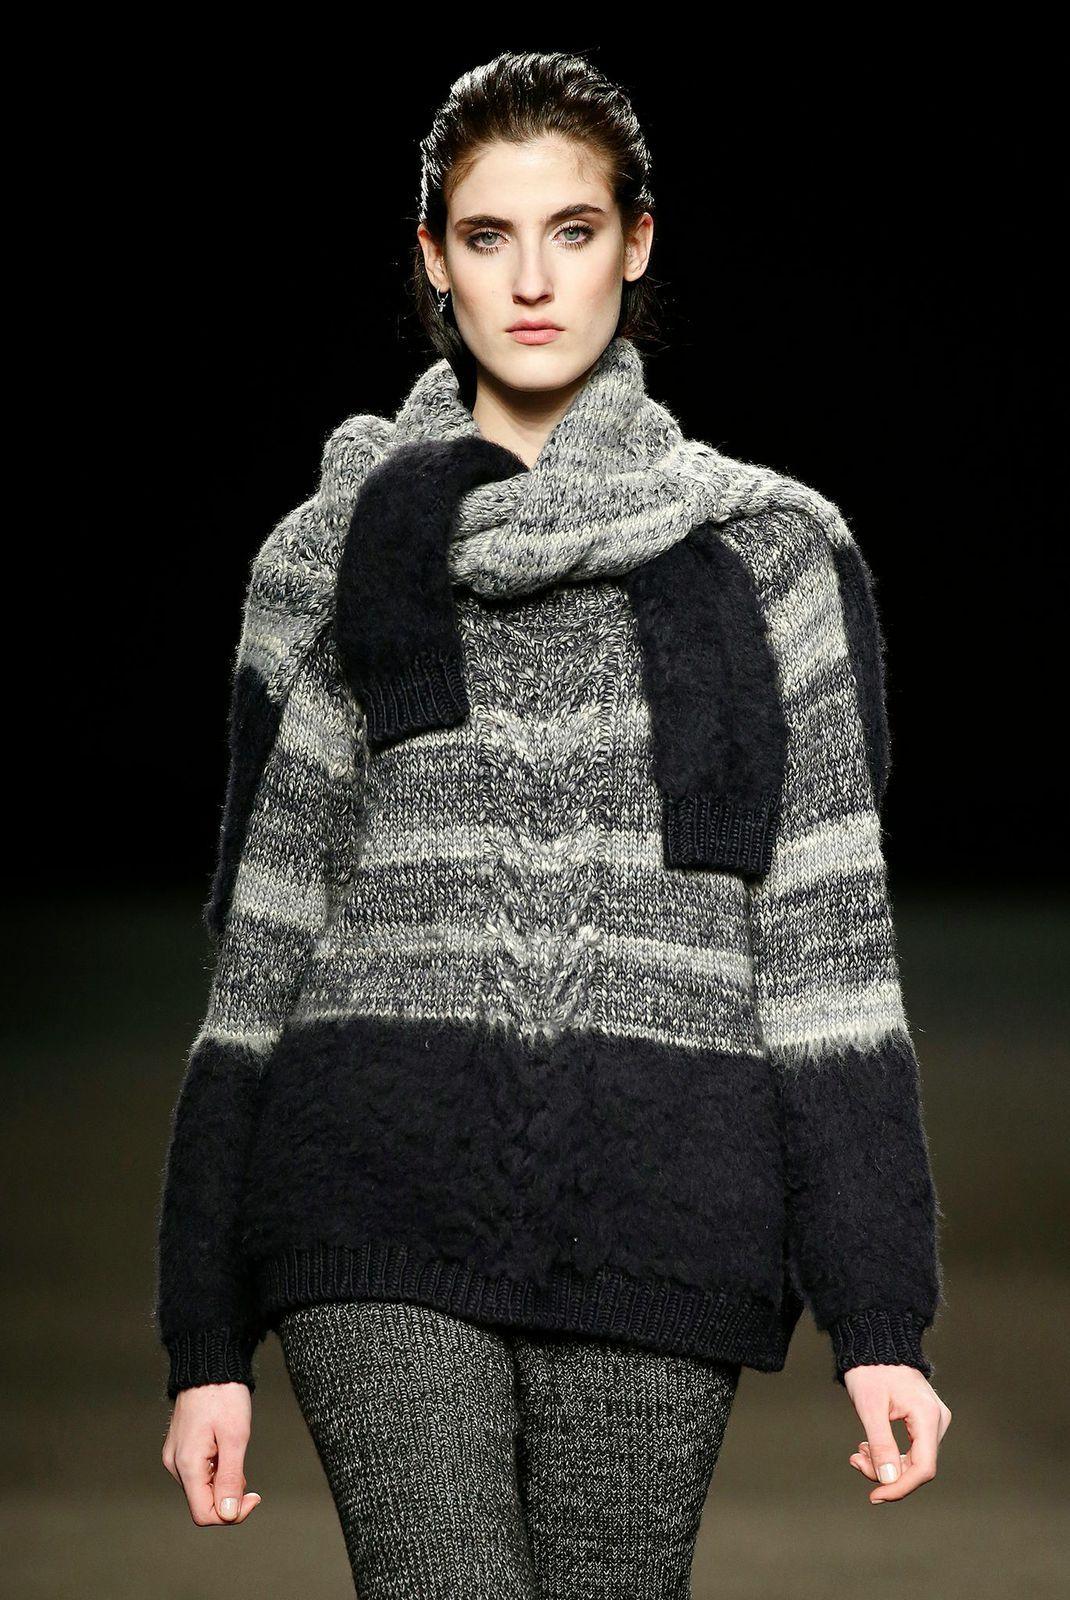 Escorpion Fall/Winter 15-16 080 Barcelona Fashion